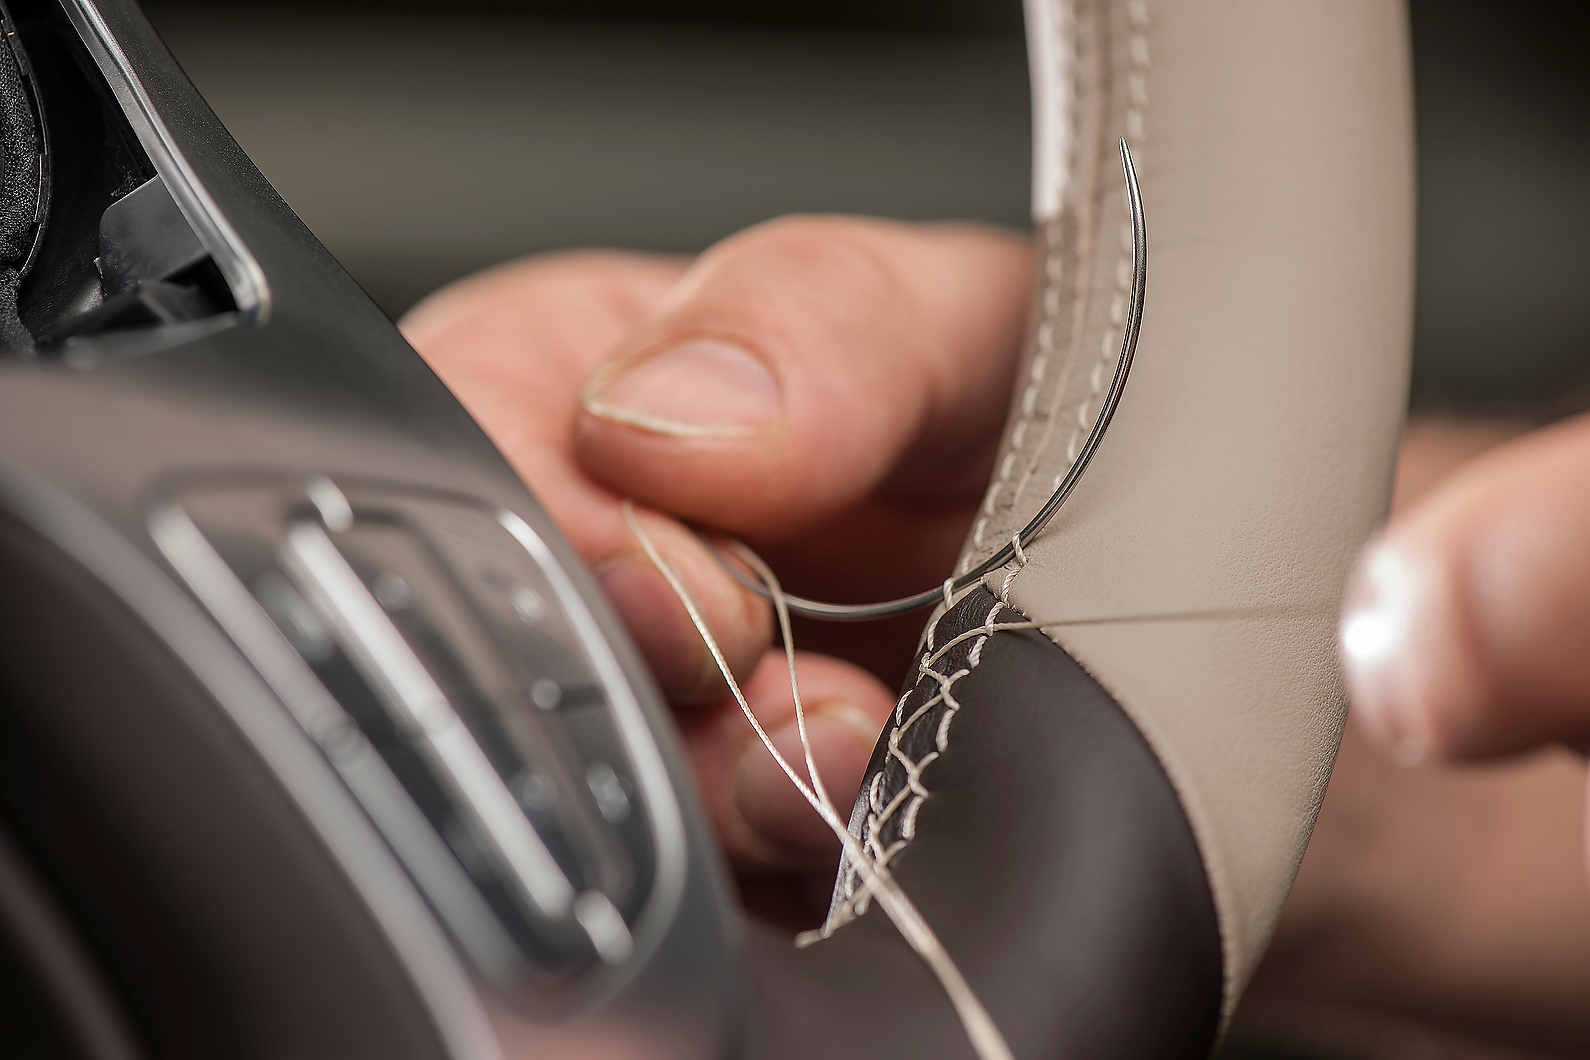 2014 mercedes s class official interior photos released autoevolution - Mercedes Benz 2014 S Class Interior